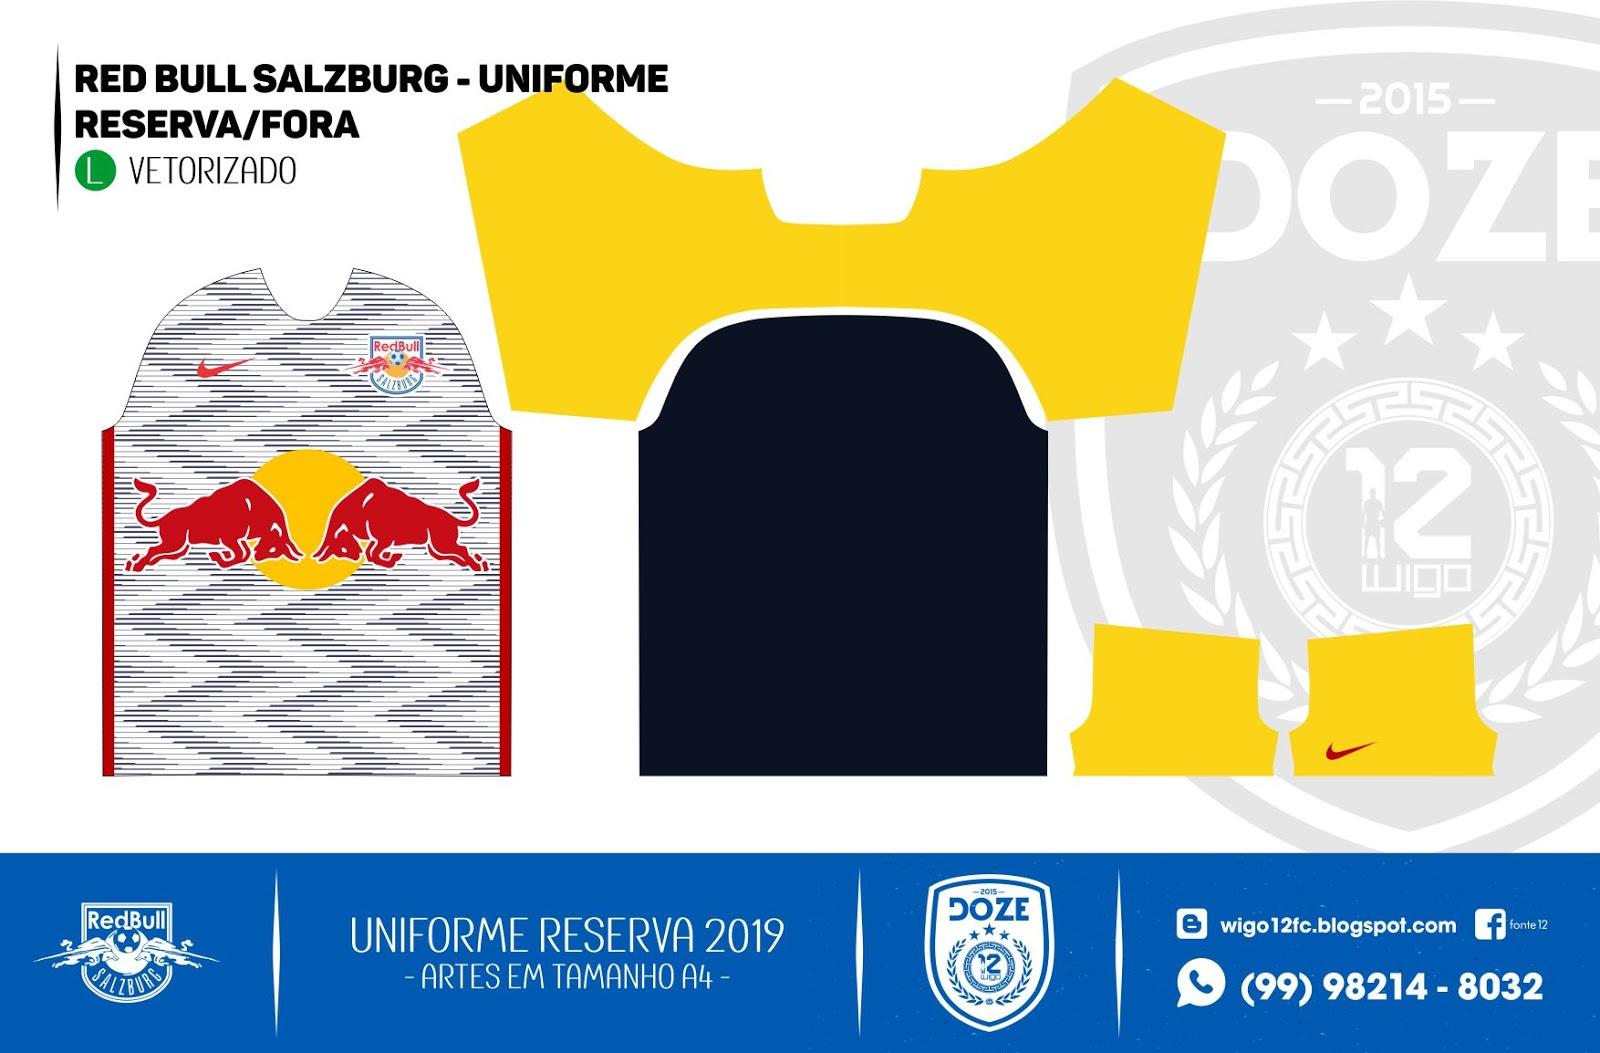 964bedd107815 Fontes Camisas de Futebol  Uniforme Red Bull Salzburg 2019